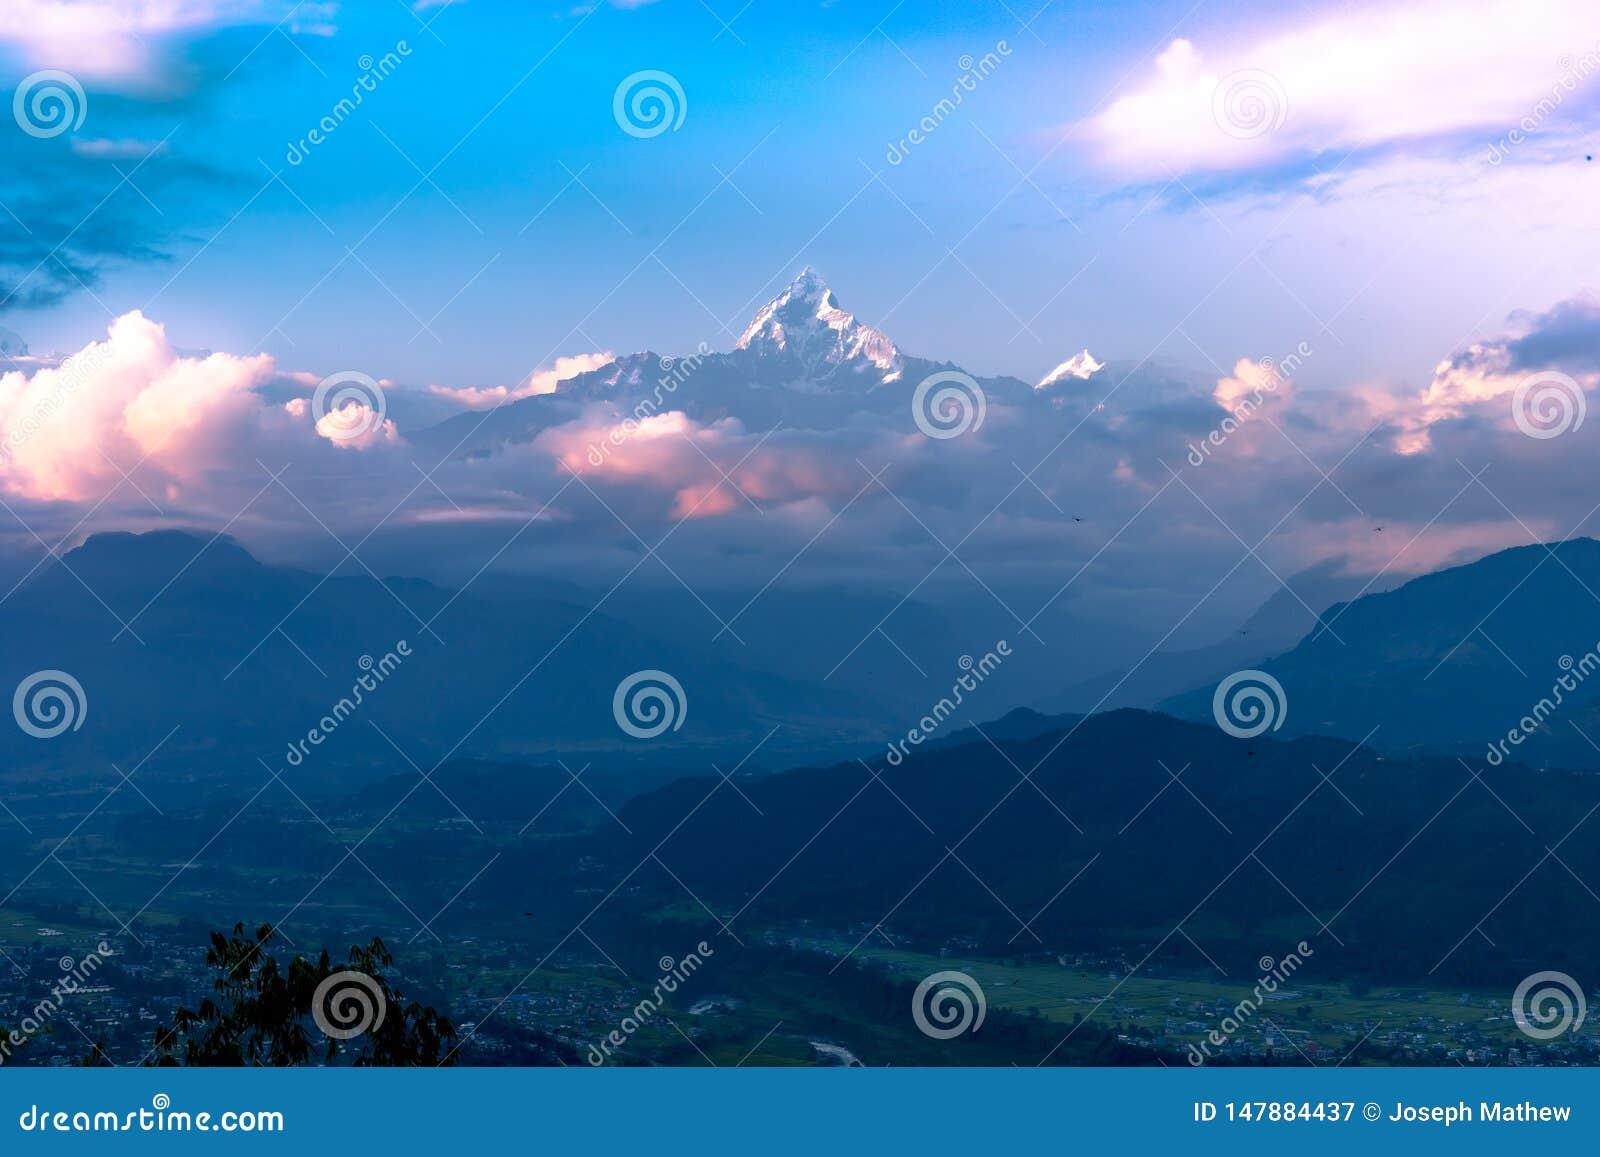 Opini?n de la puesta del sol de la monta?a de la espina de pescado de la colina de Sarangkot en Pokhara, Nepal